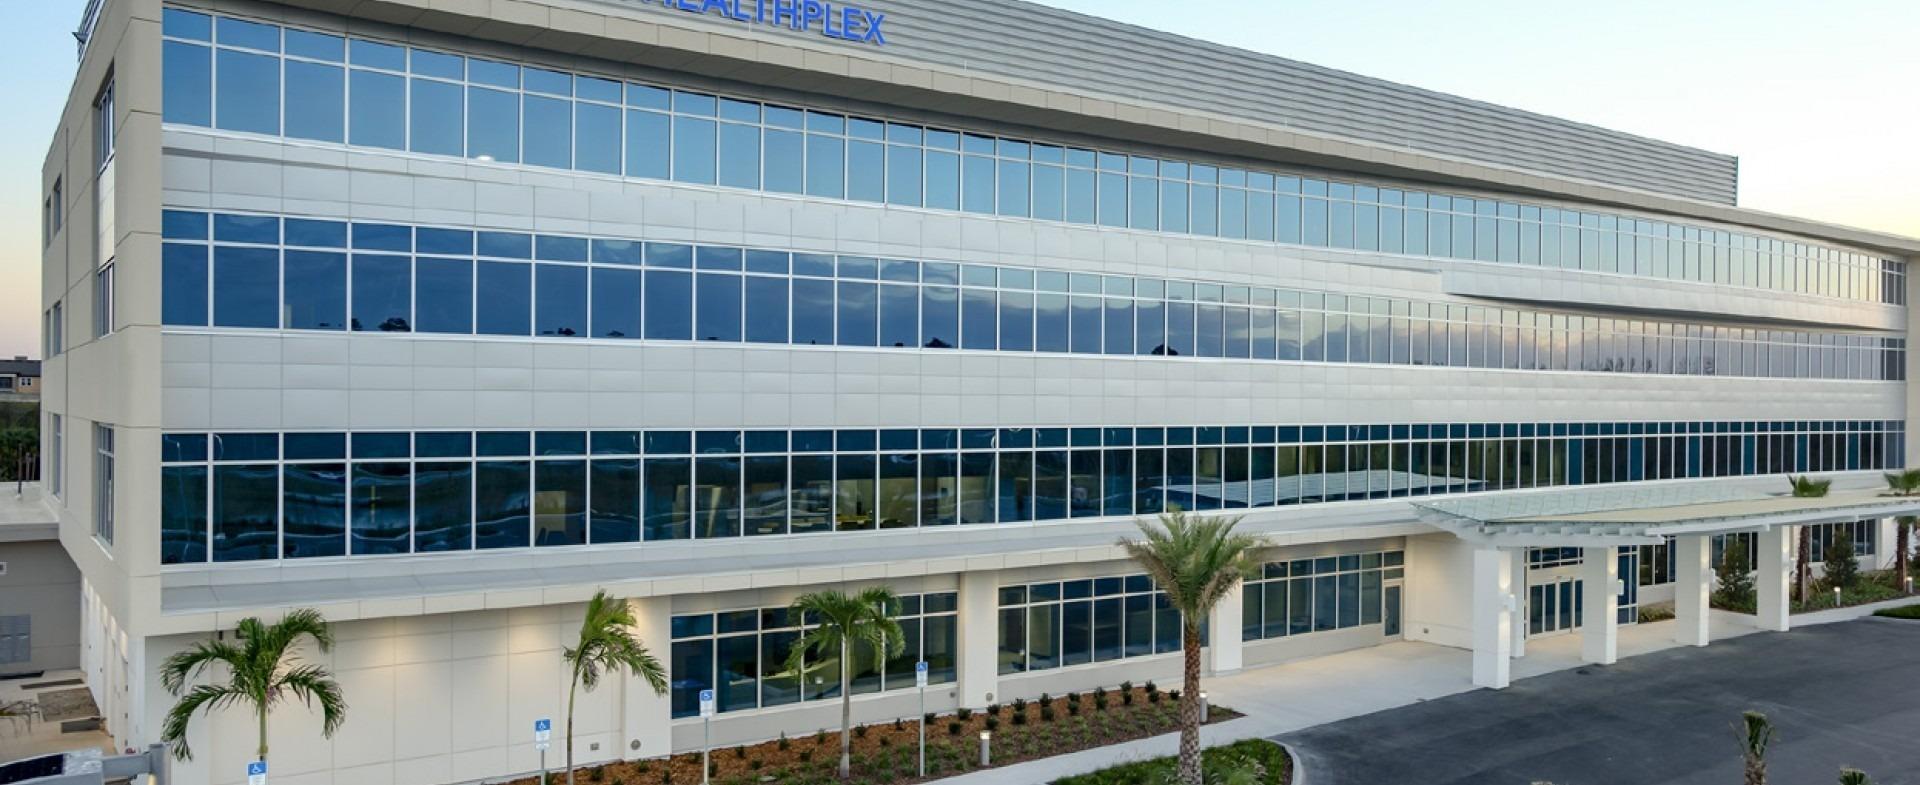 Tgh Brandon Healthplex Tampa General Hospital